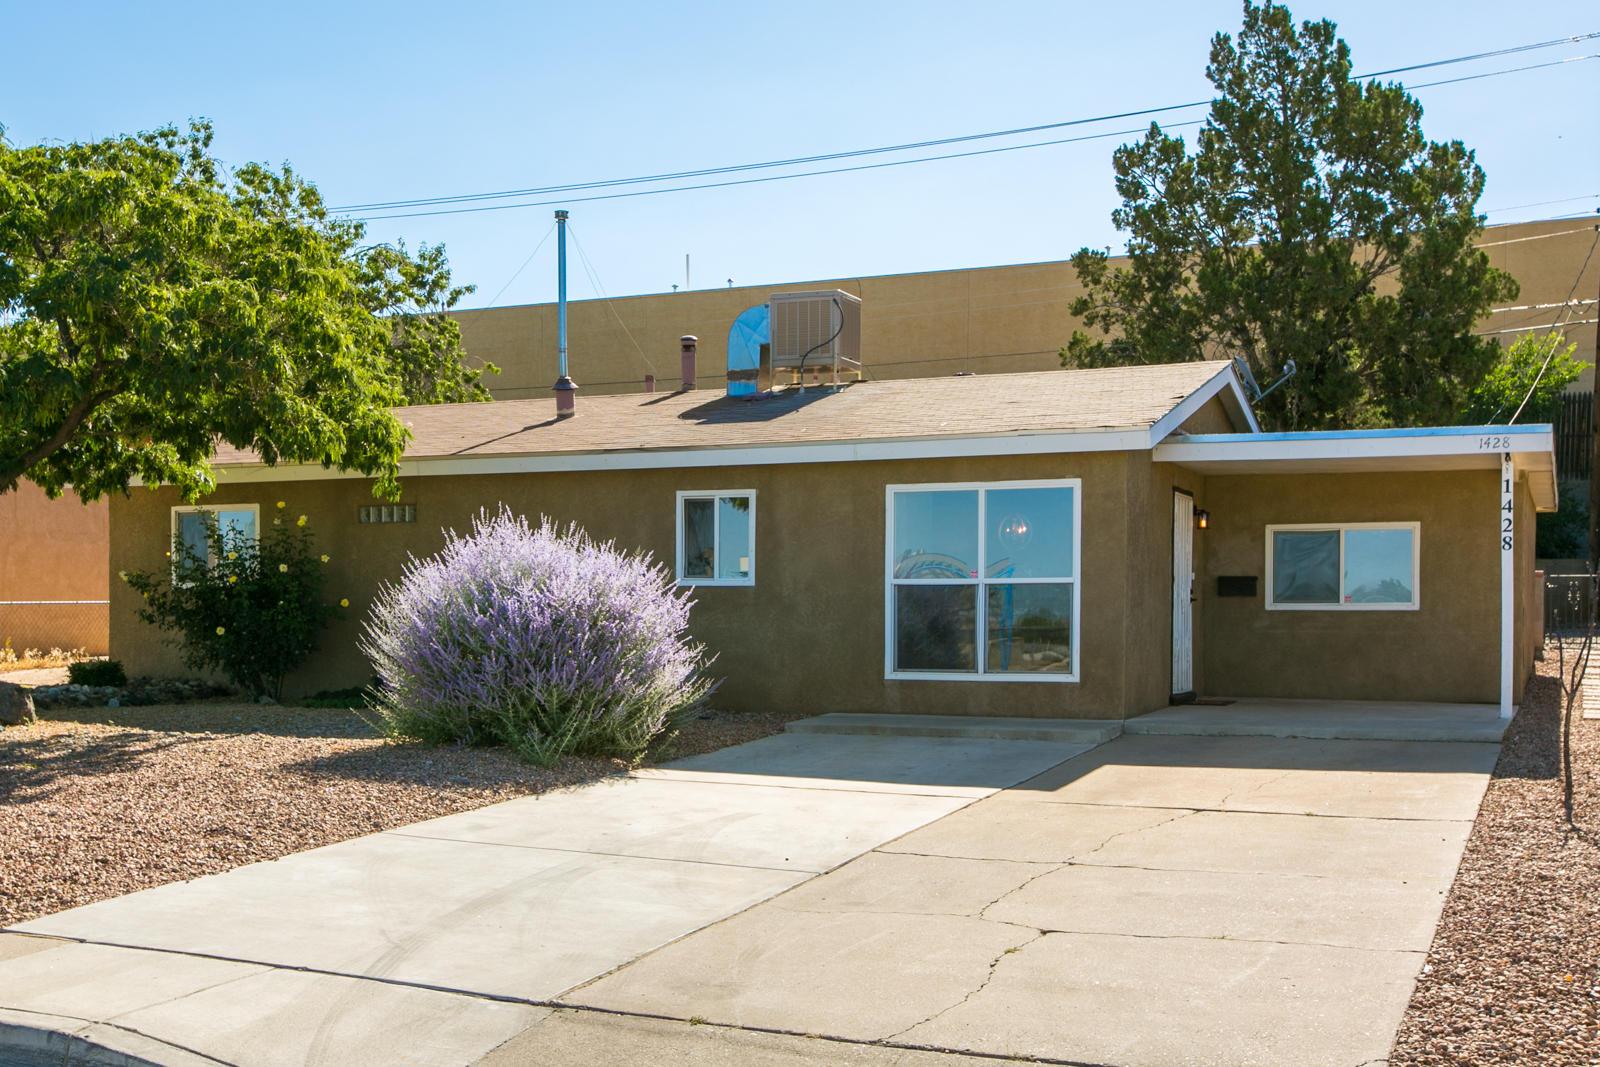 1428 MURIEL Street NE Property Photo - Albuquerque, NM real estate listing